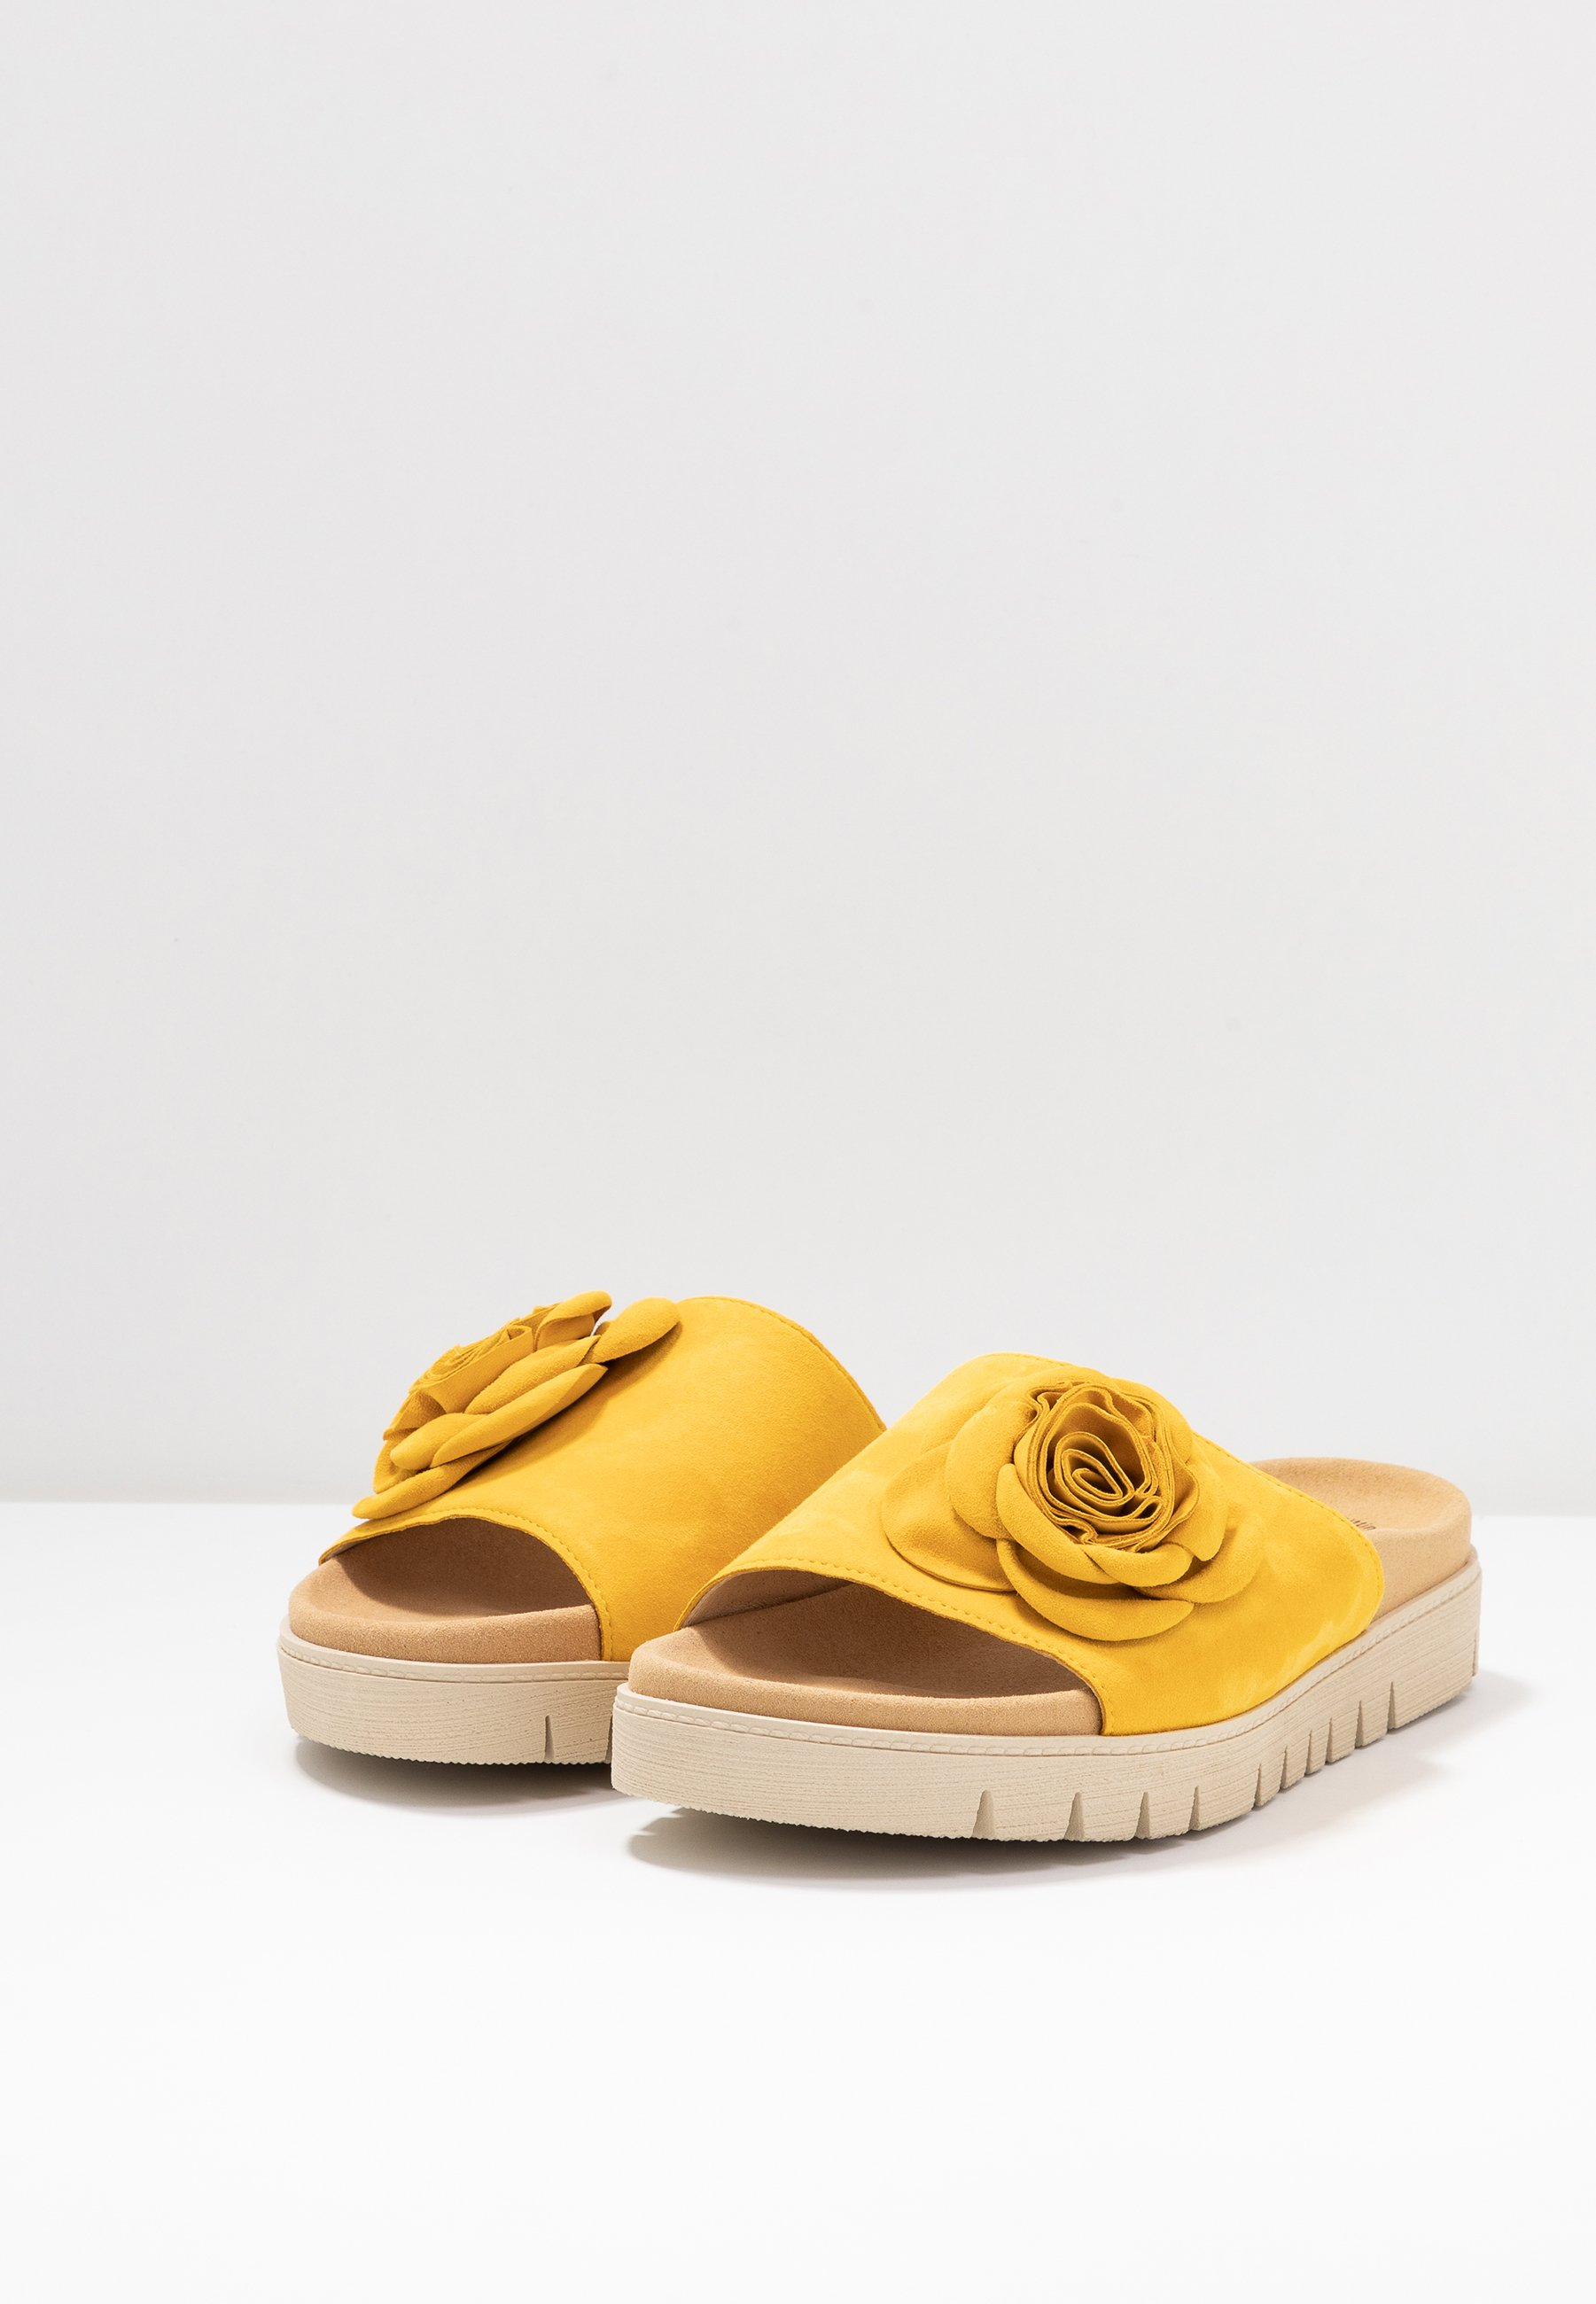 Gabor Pantolette flach sun/gelb